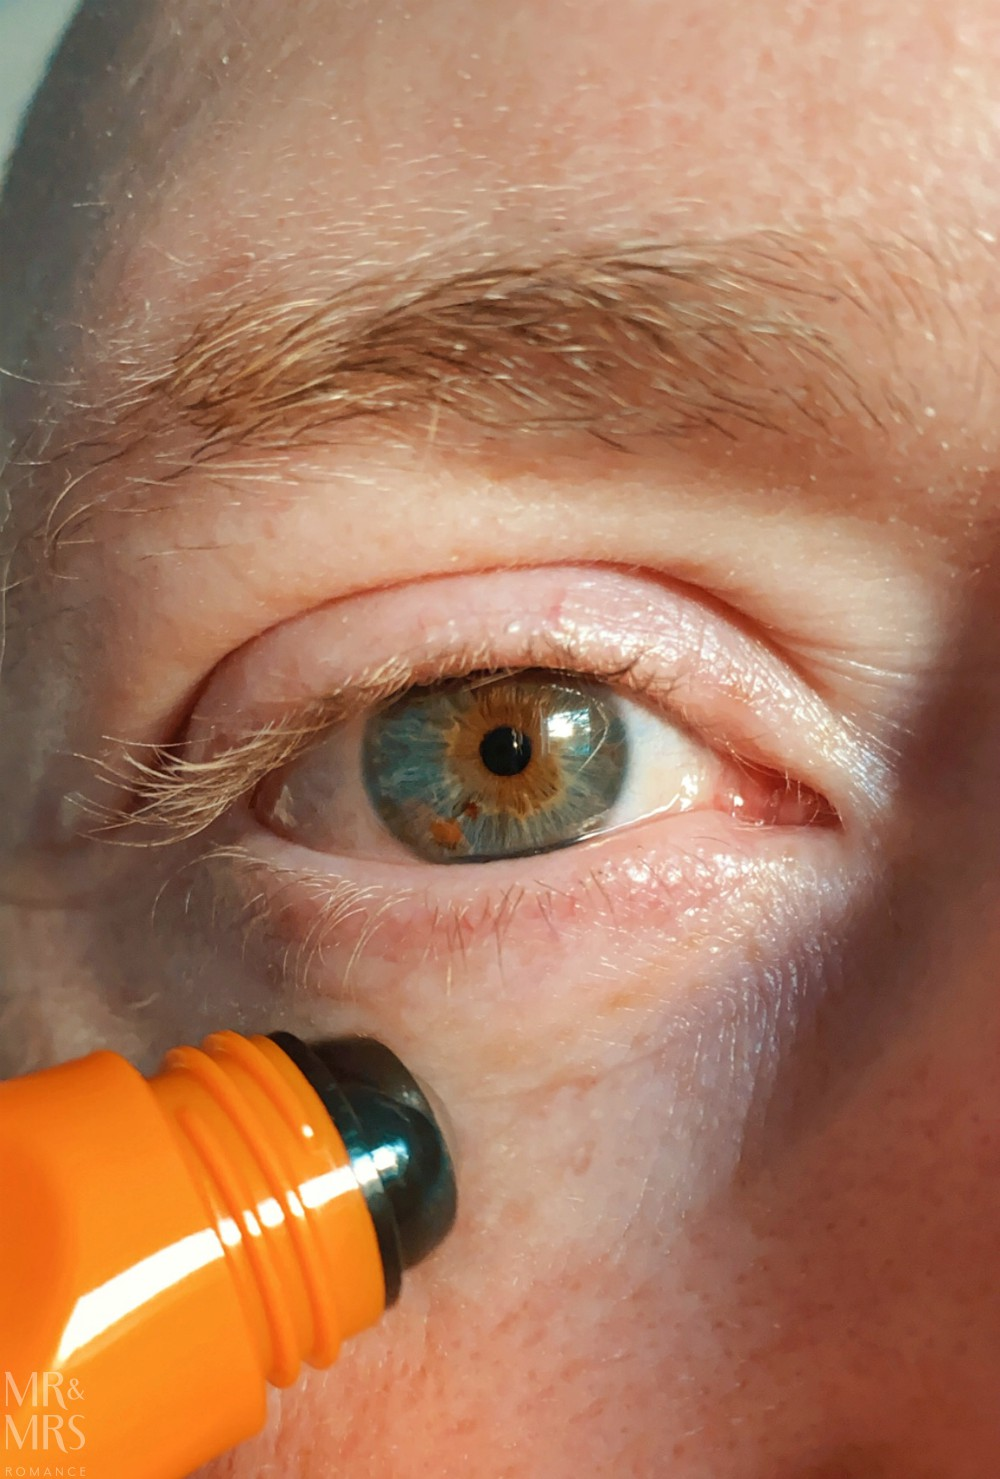 L'Oreal Men Expert Hydra Energetic eye roll-on